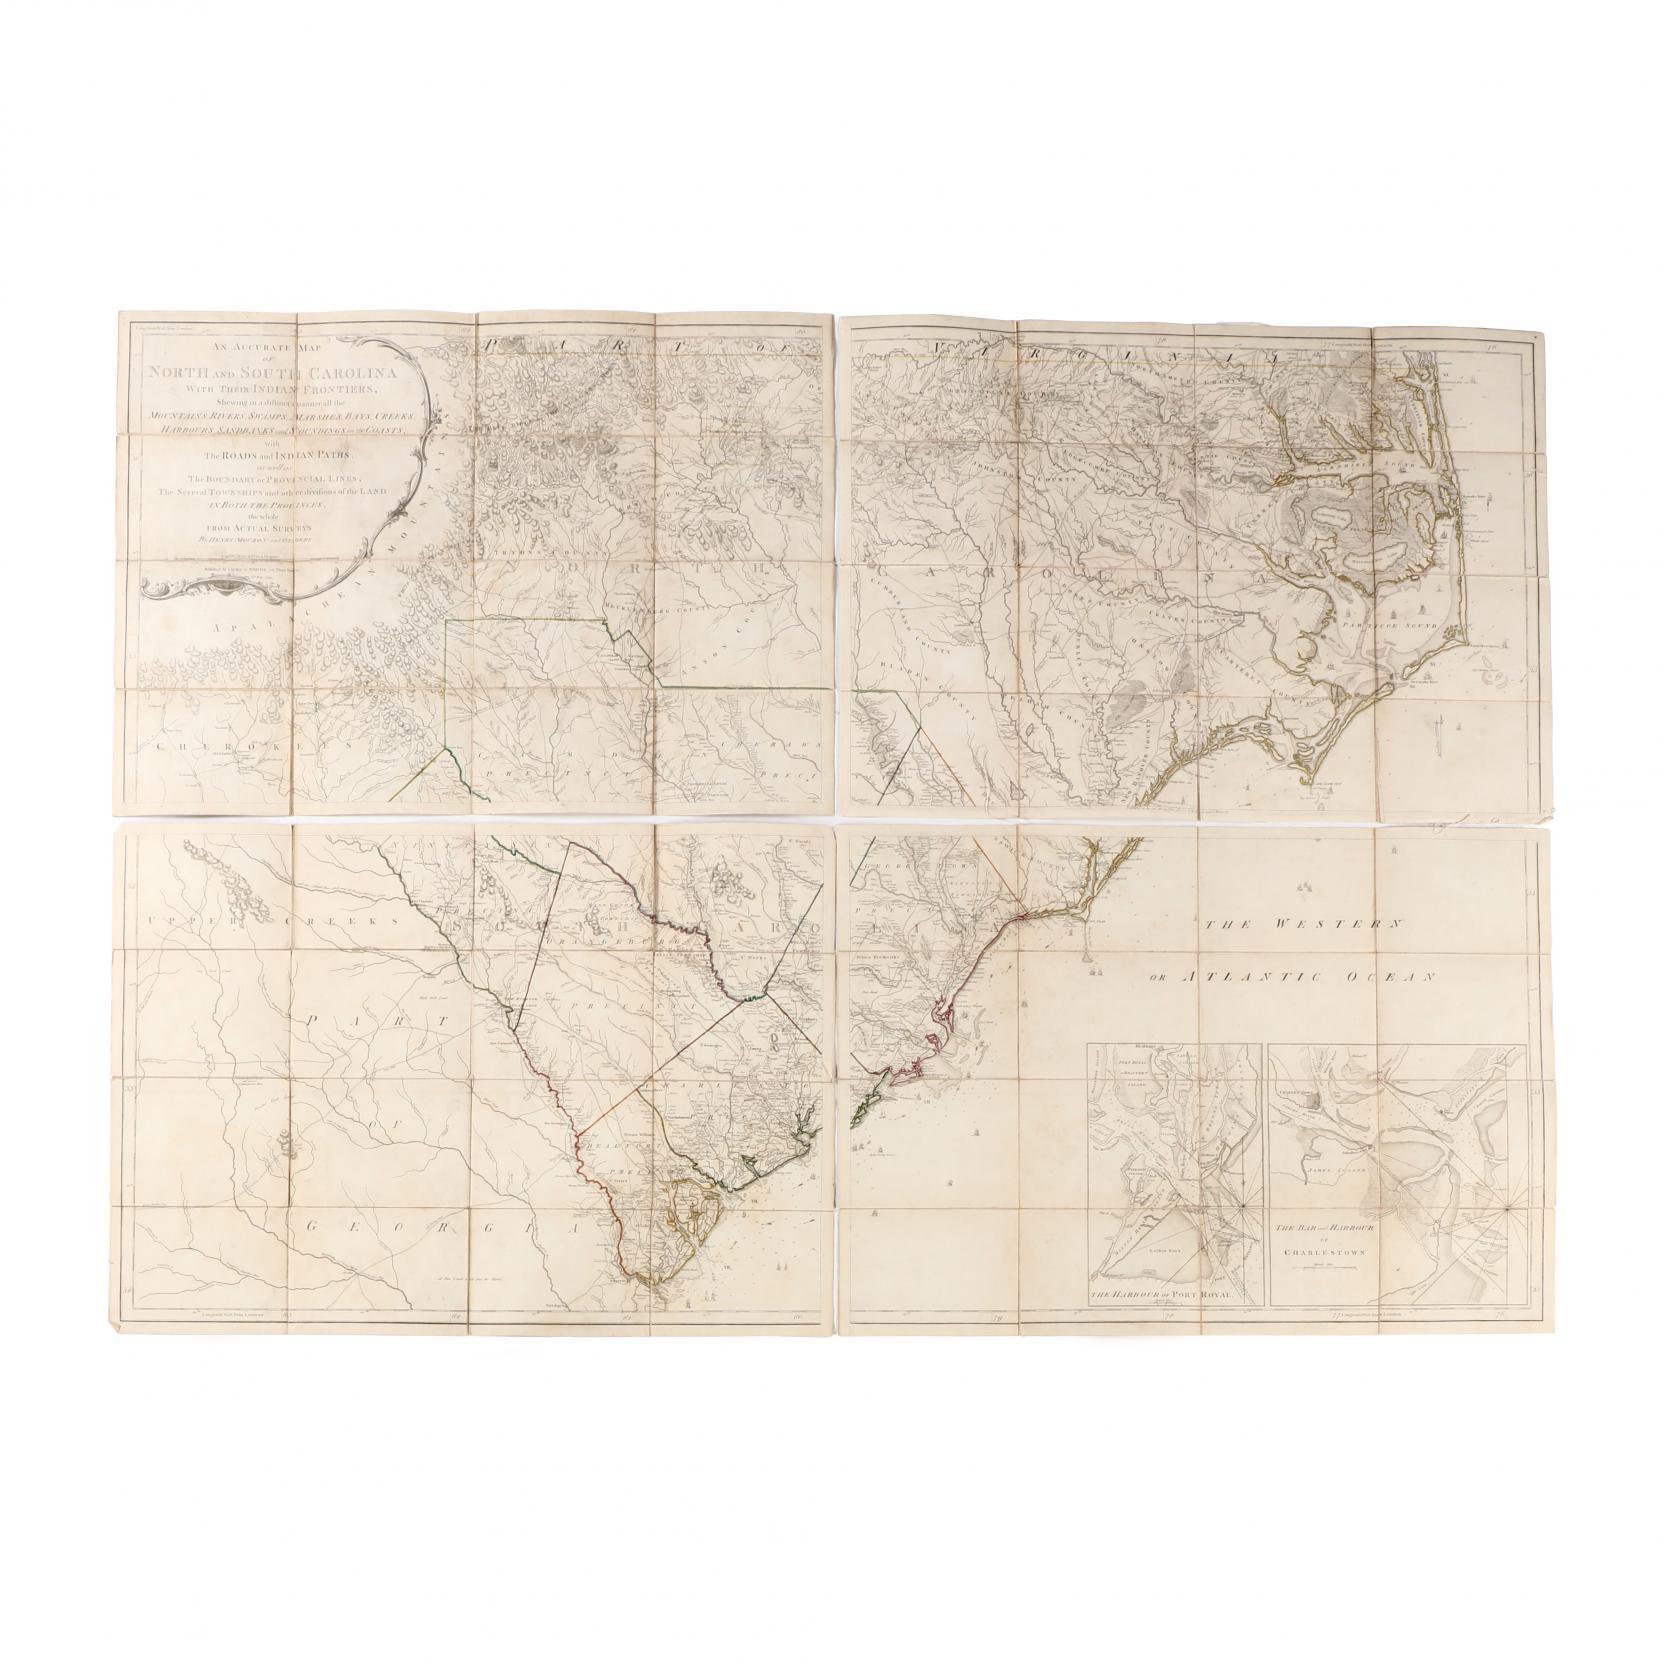 a-rare-folded-1794-edition-of-mouzon-s-celebrated-map-of-the-carolinas